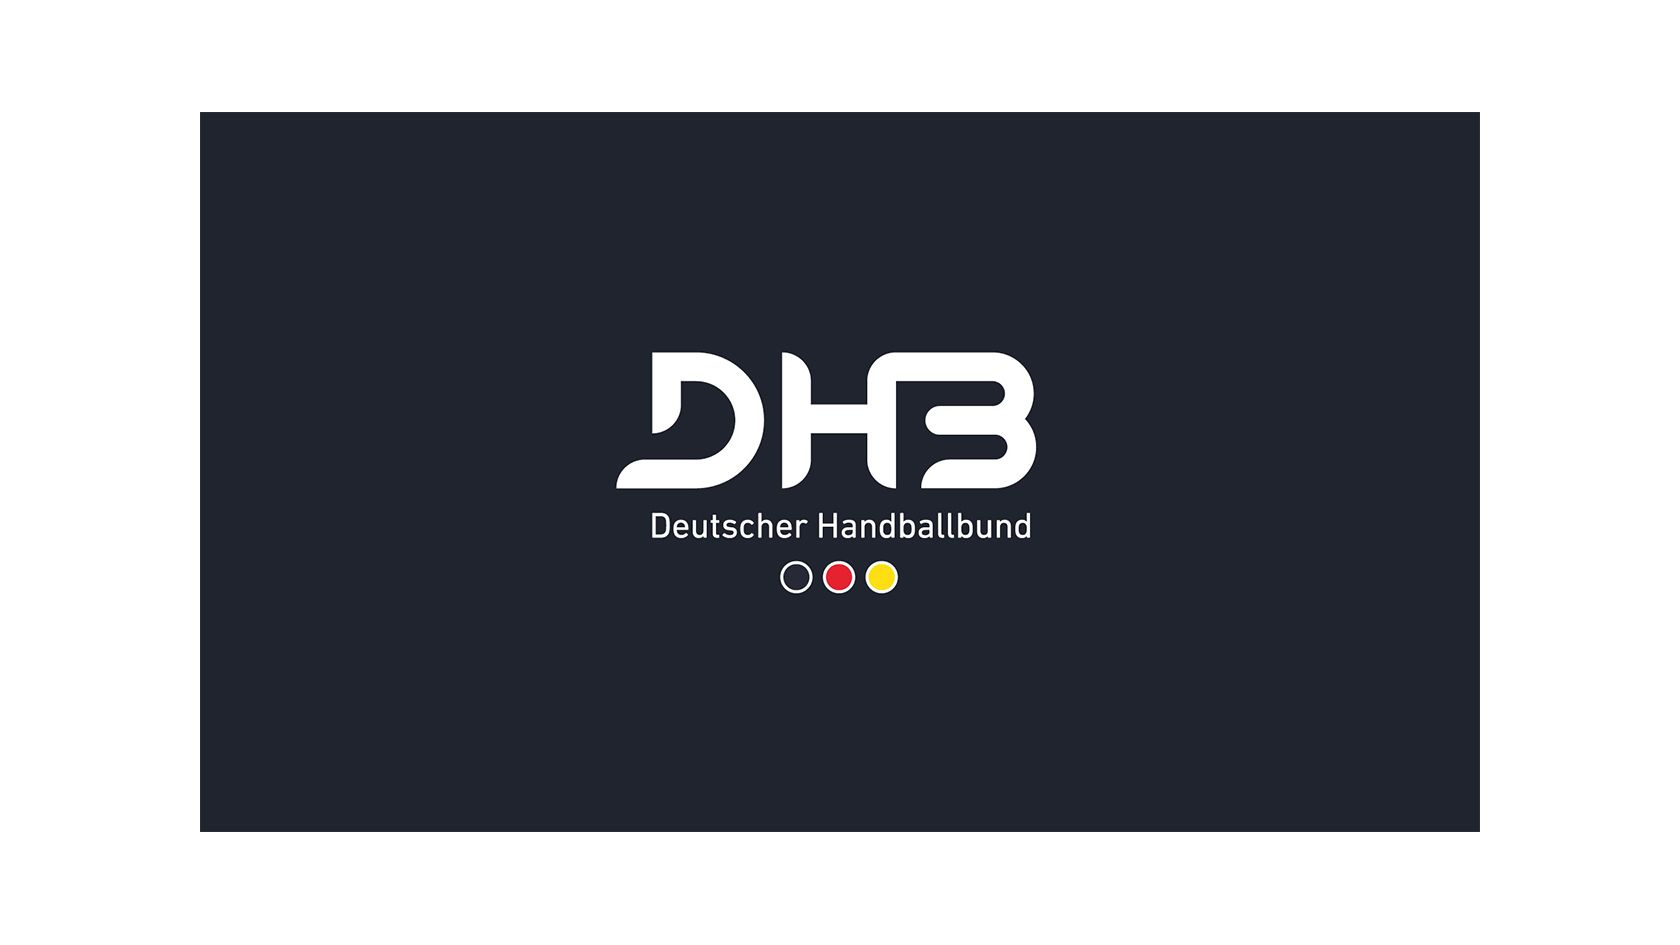 (c) Dhb.de